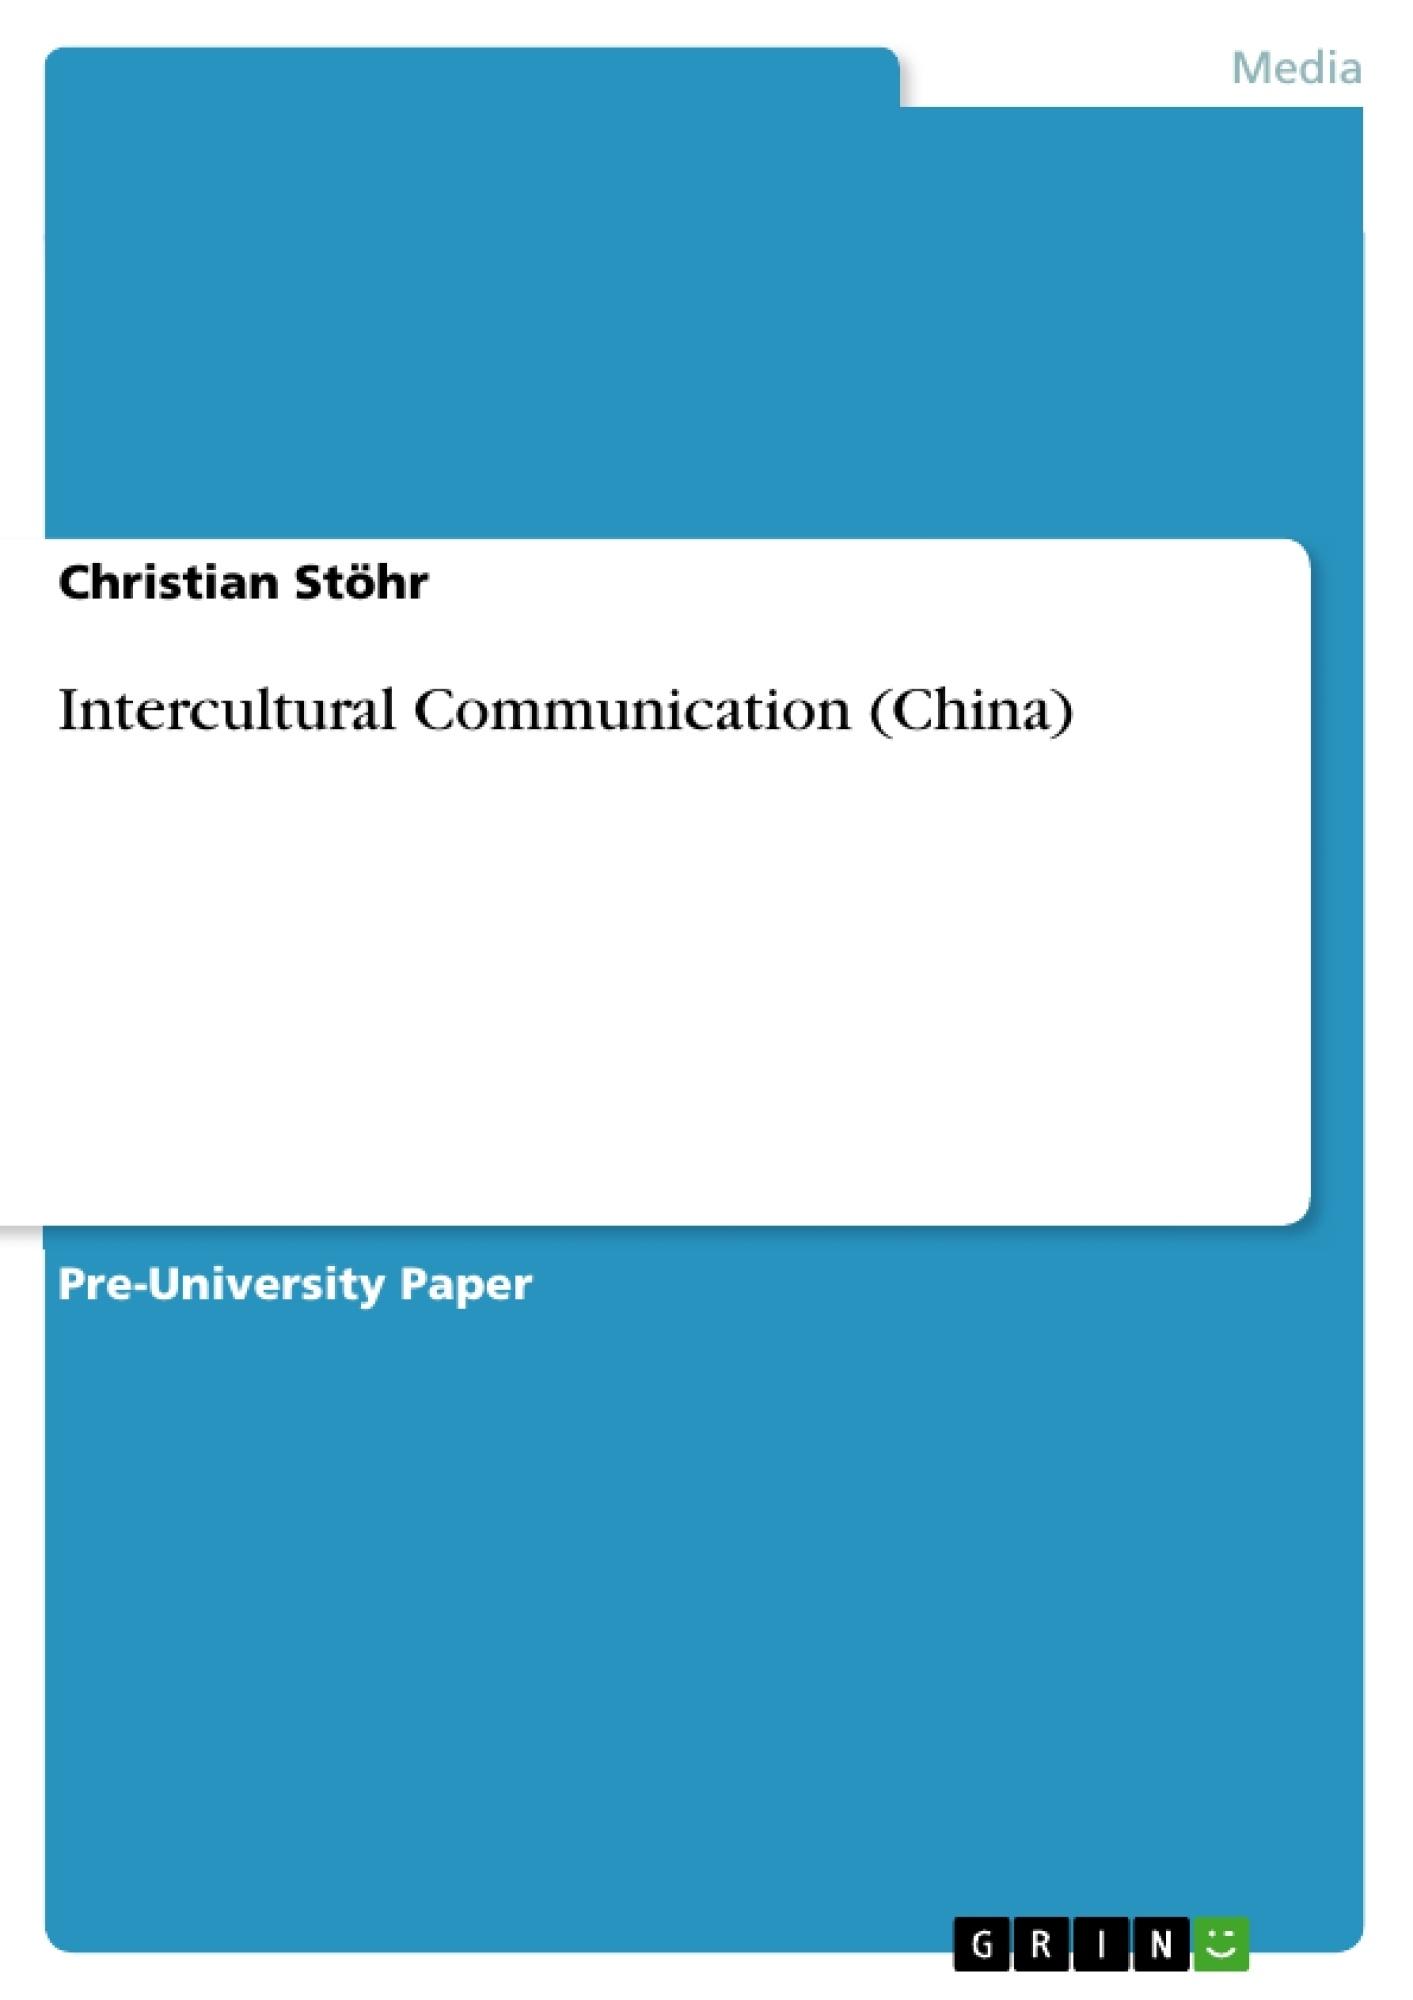 Dissertation on intercultural communication